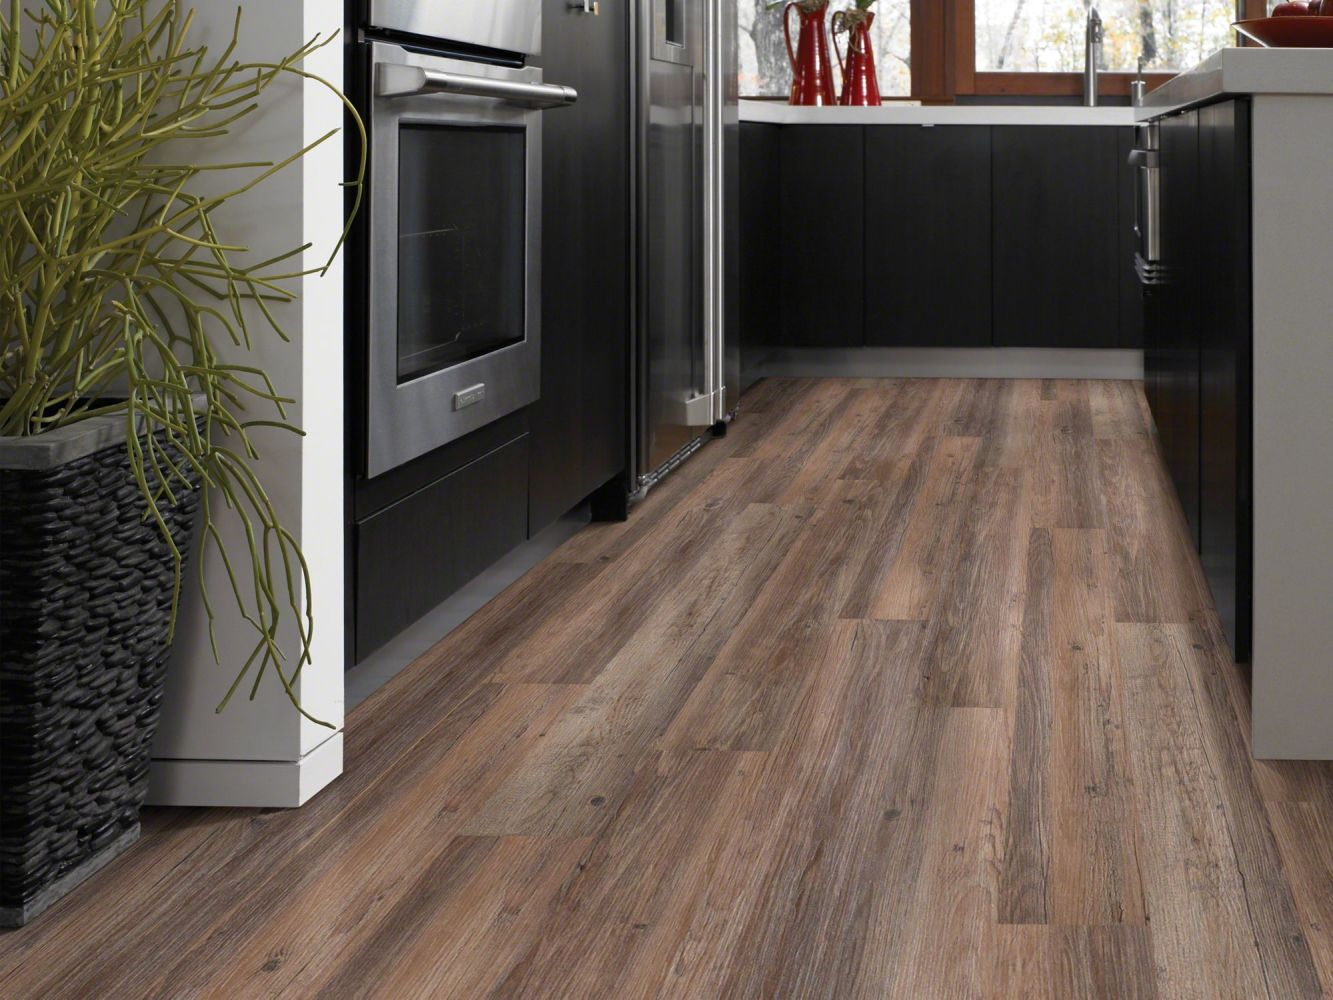 Shaw Floors Nfa HS World Bazar 12 Breckenridge 00722_VH511